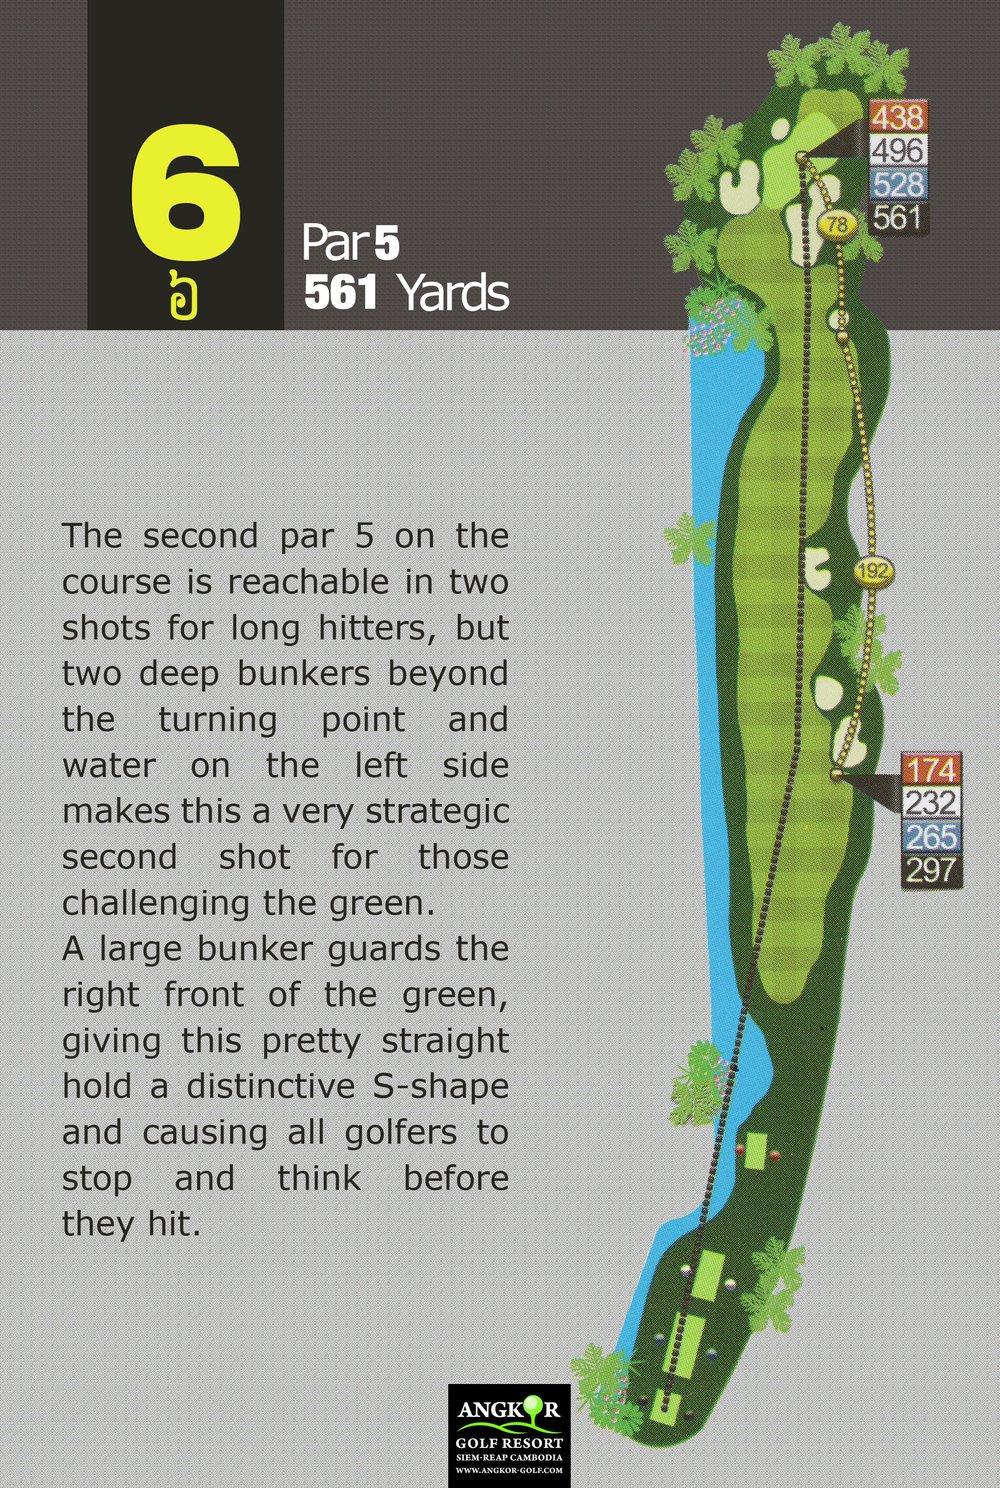 Hole 6 - Par 5 561 Yards